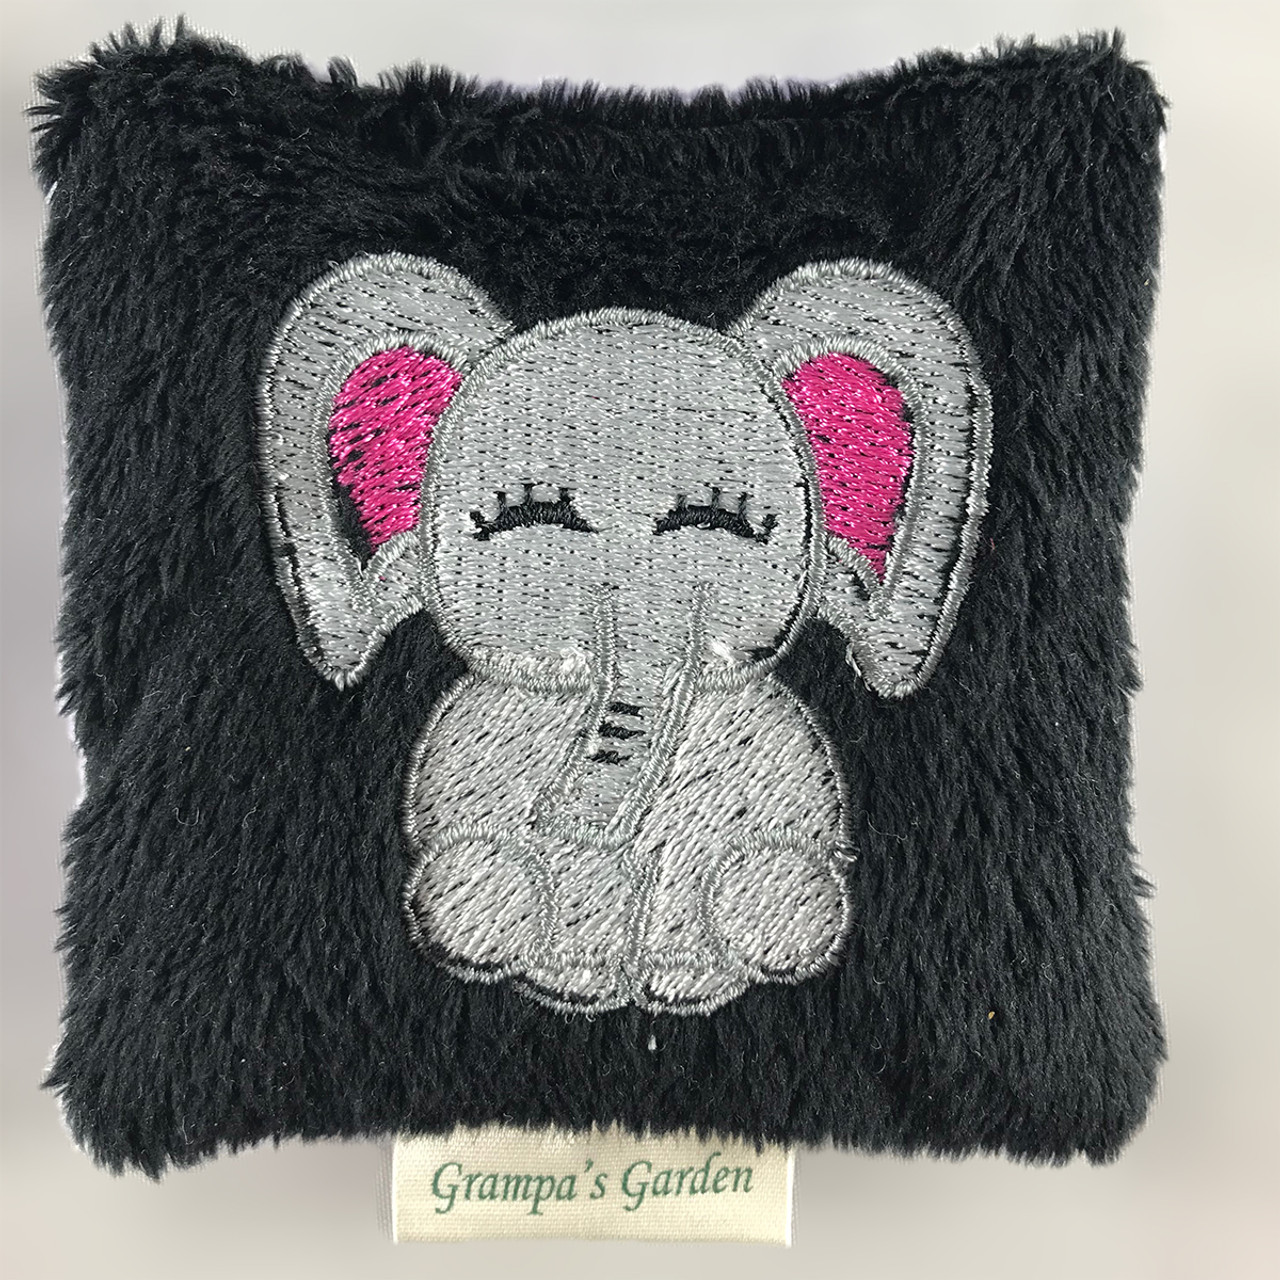 Elephant Fidget Pocket Pet Toy Scented Sensory, Stress, Fidget Toy from Grampa's Garden Made in Maine USA